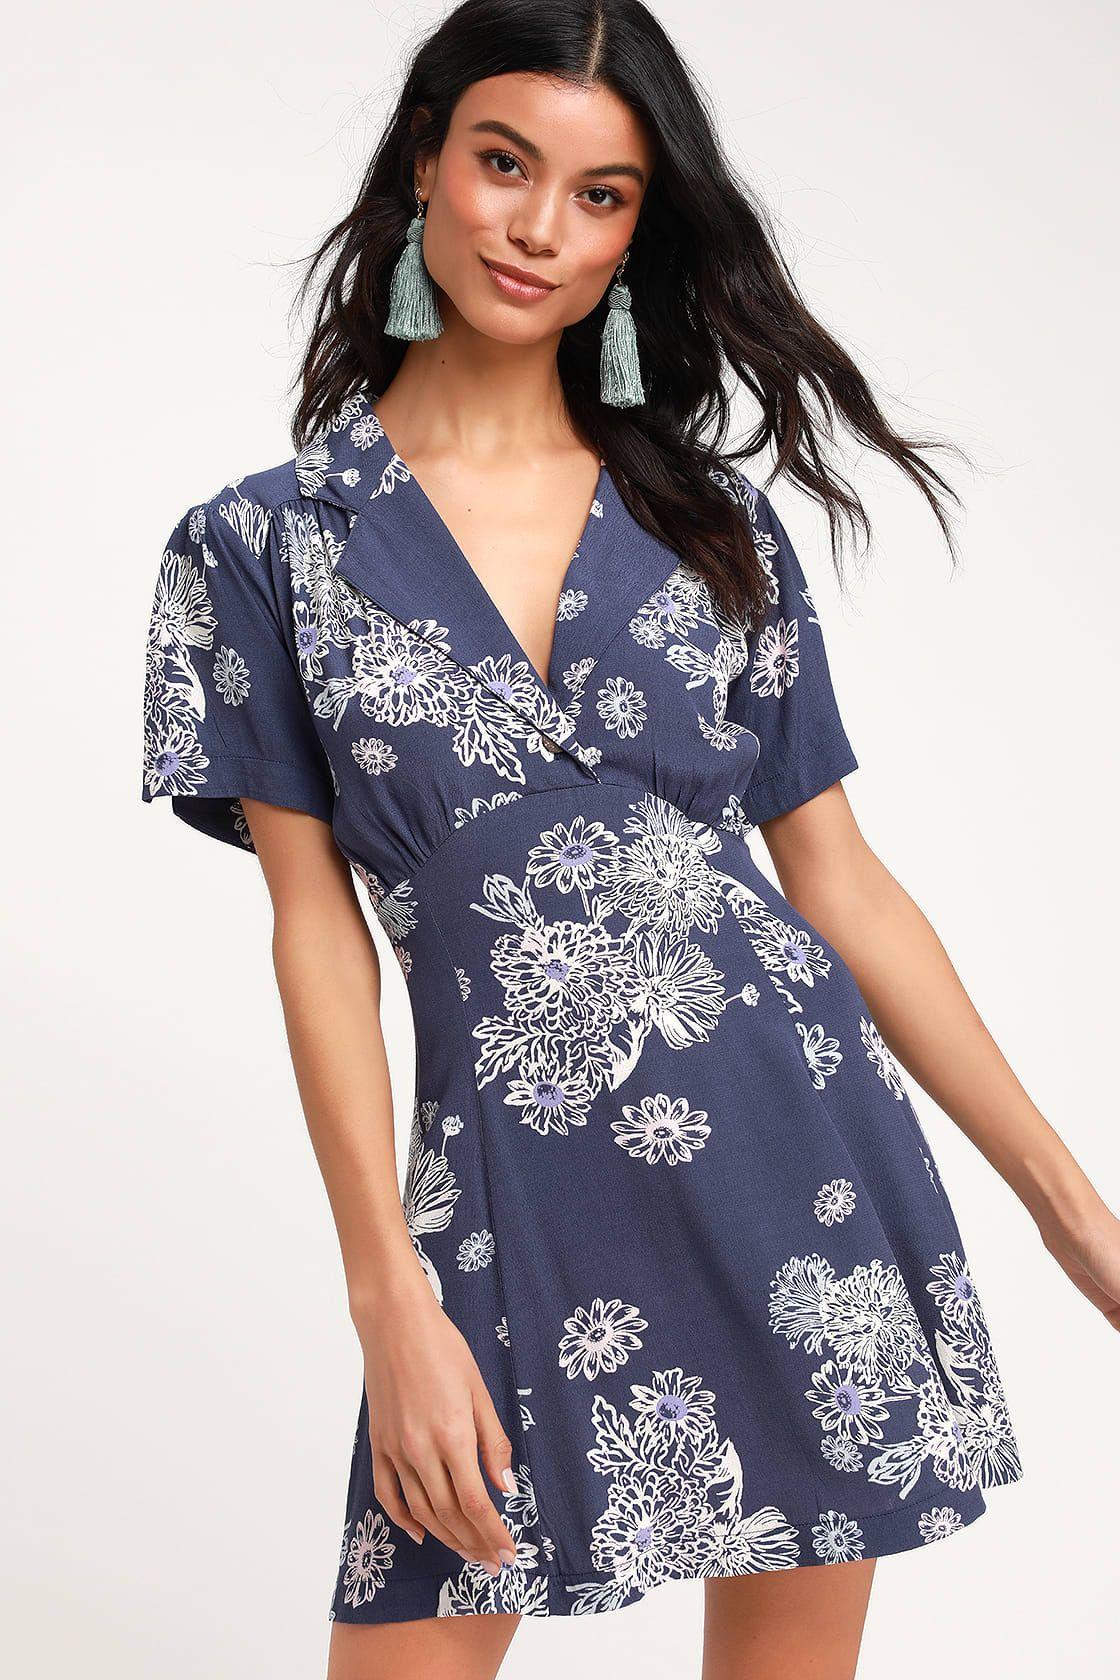 Blue Hawaii Washed Blue Floral Print Short Sleeve Mini Dress Short Sleeve Mini Dress Long Sleeve Wrap Dress Light Blue Mini Dress